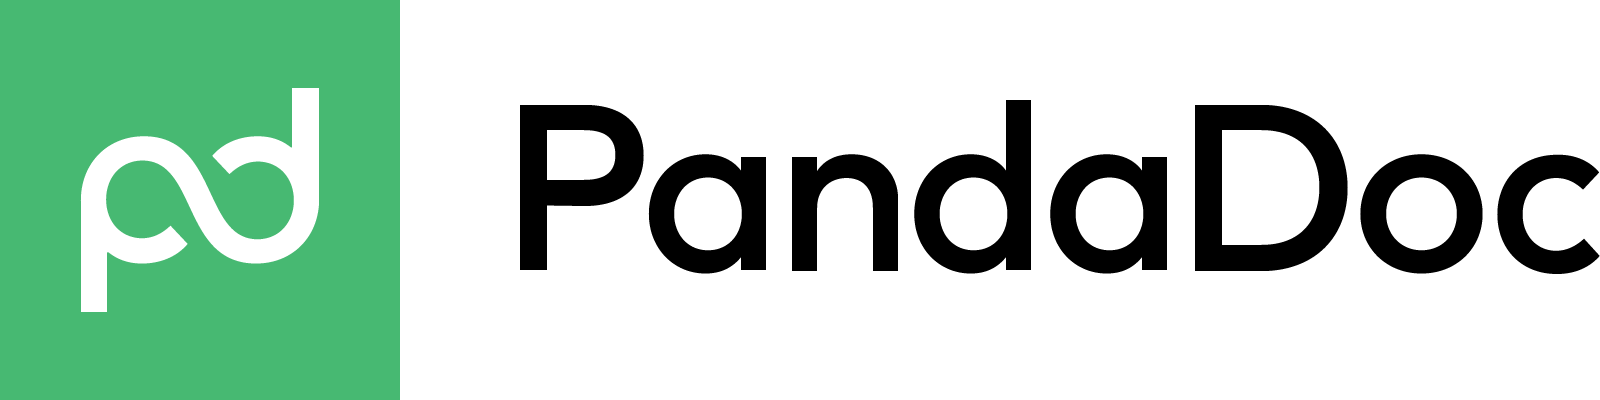 PandaDoc_logo_ProductMan_IAMPM